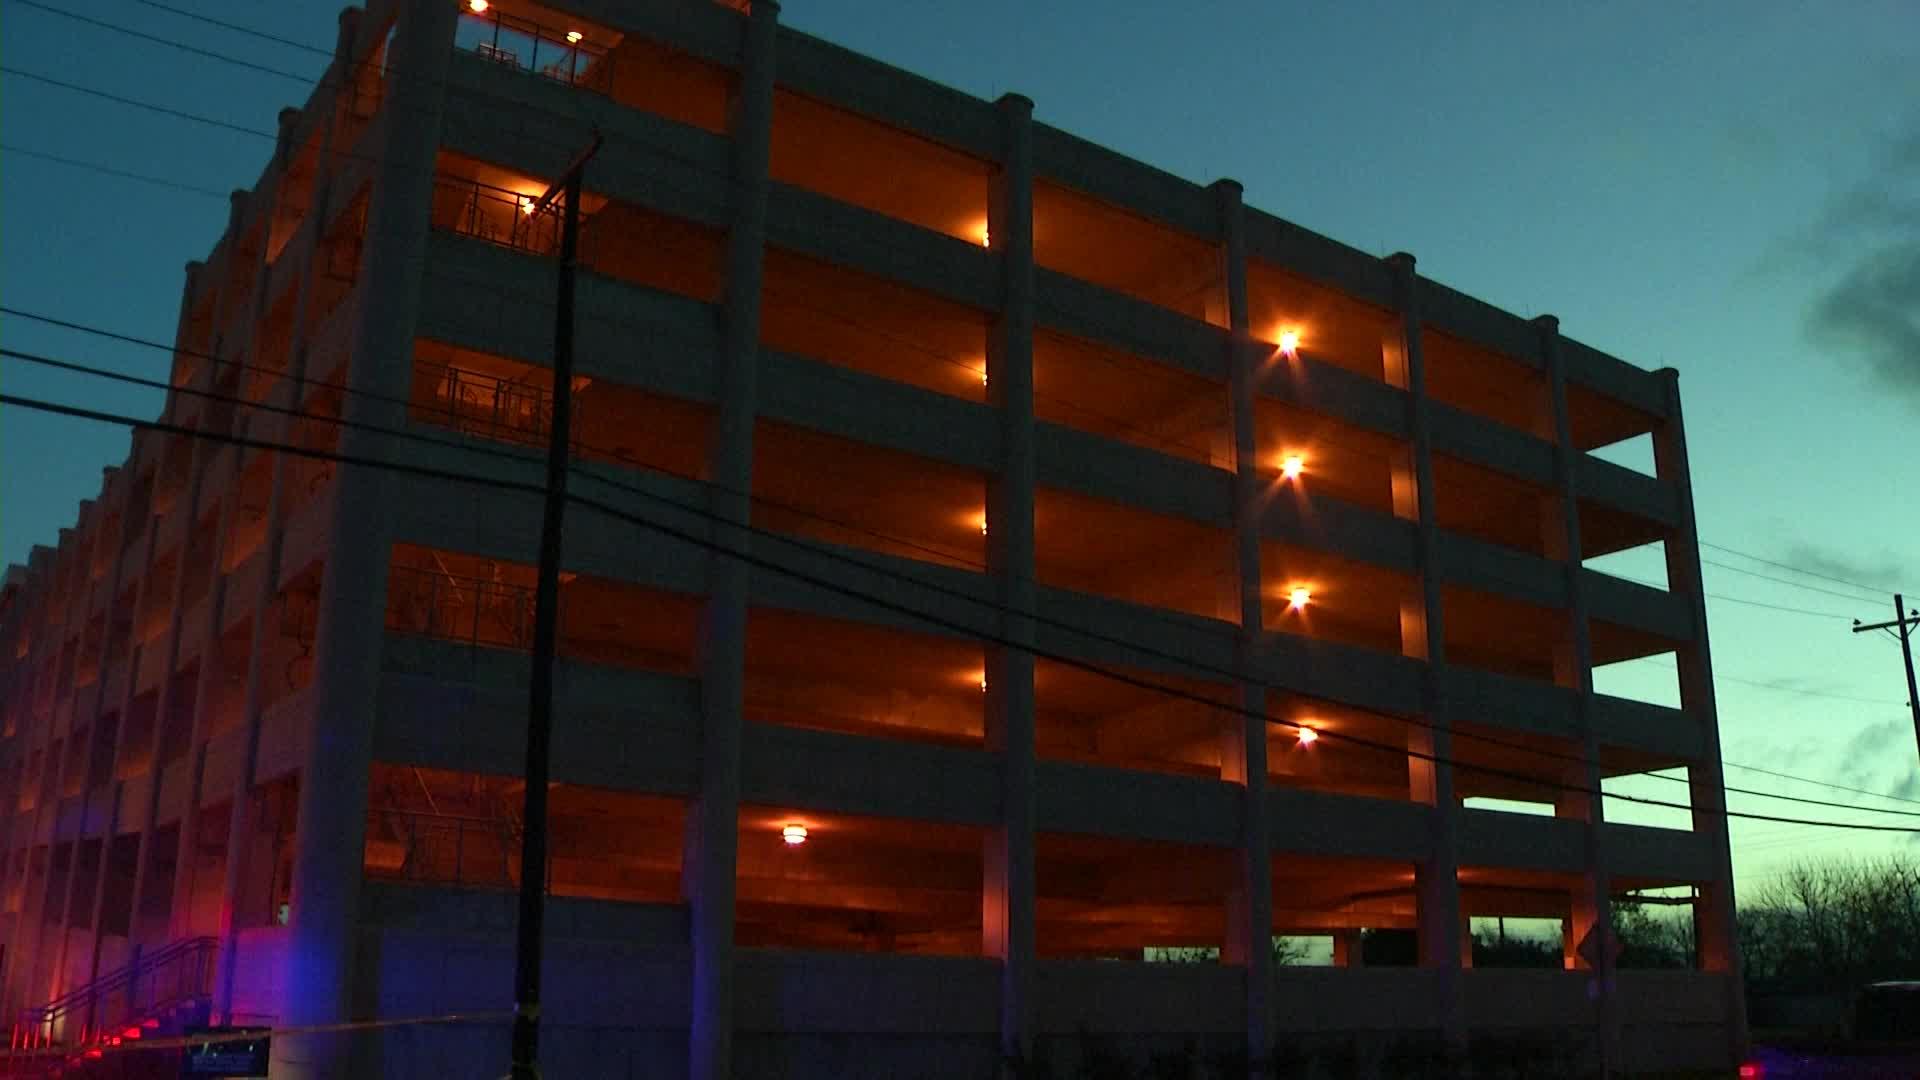 Parking garage 2 Texas girls jumped from (NBC News photo)_399541